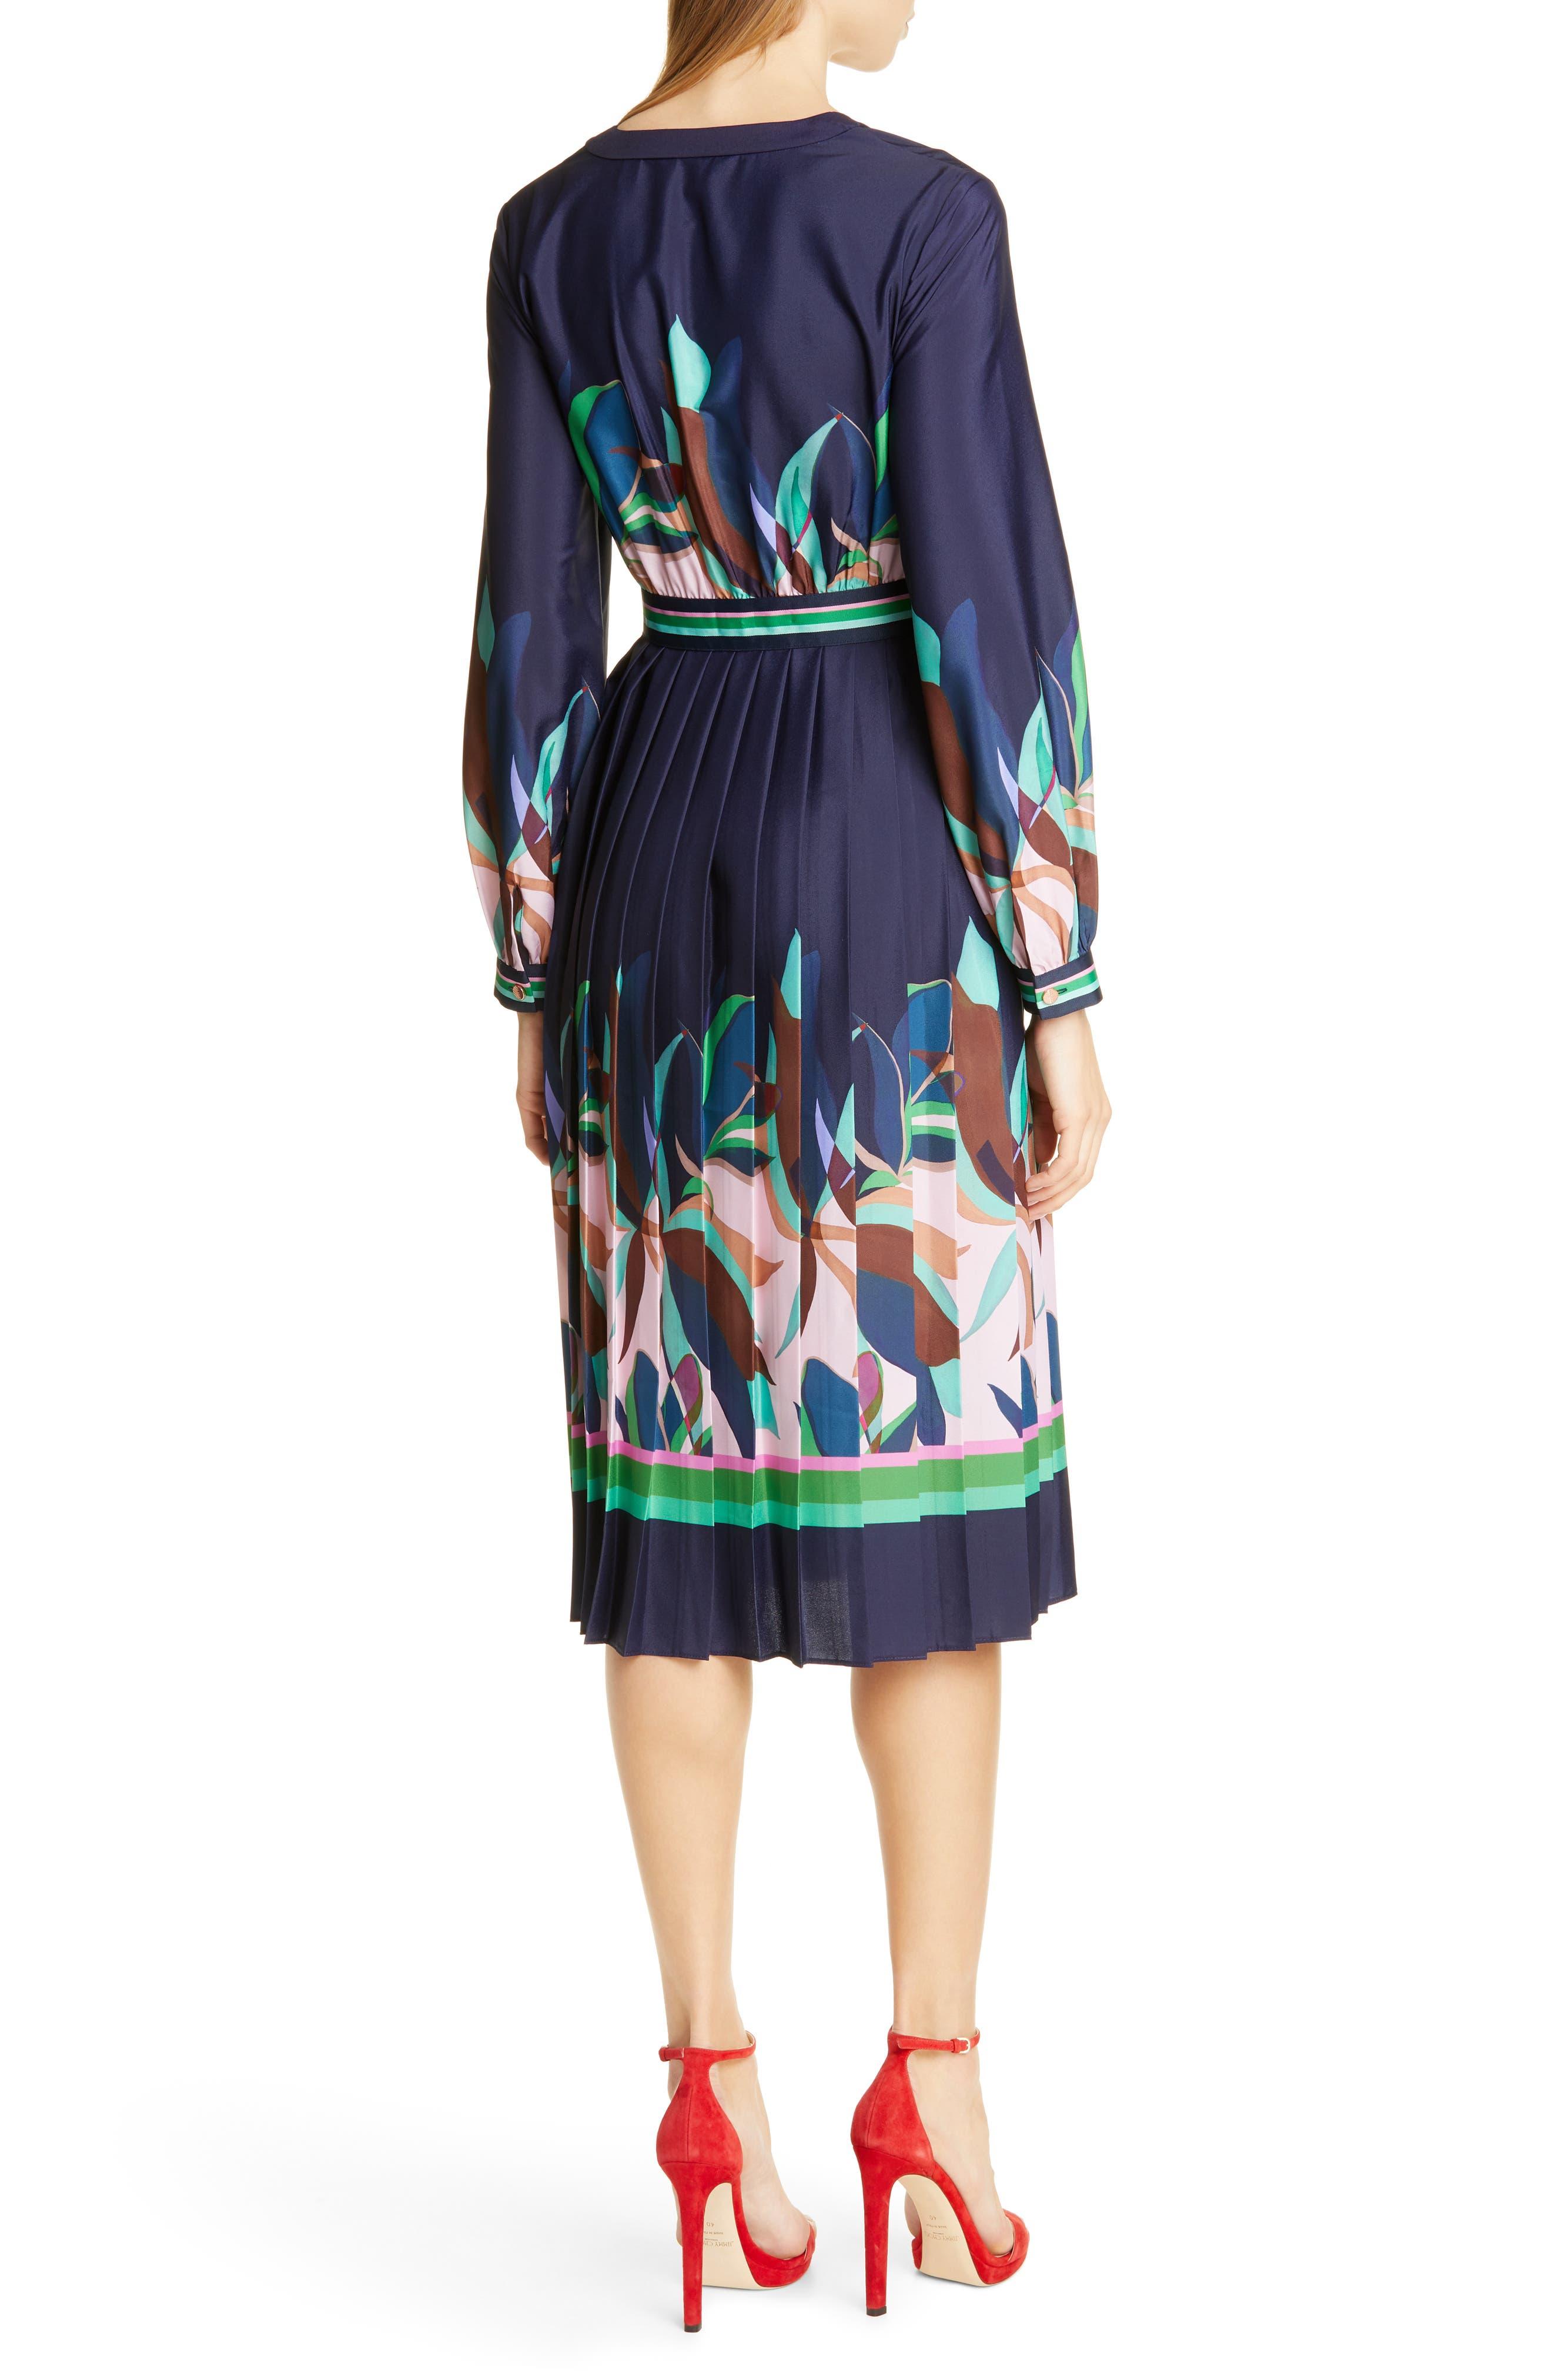 TED BAKER LONDON, Leonore Supernatural Fit & Flare Dress, Alternate thumbnail 2, color, NAVY